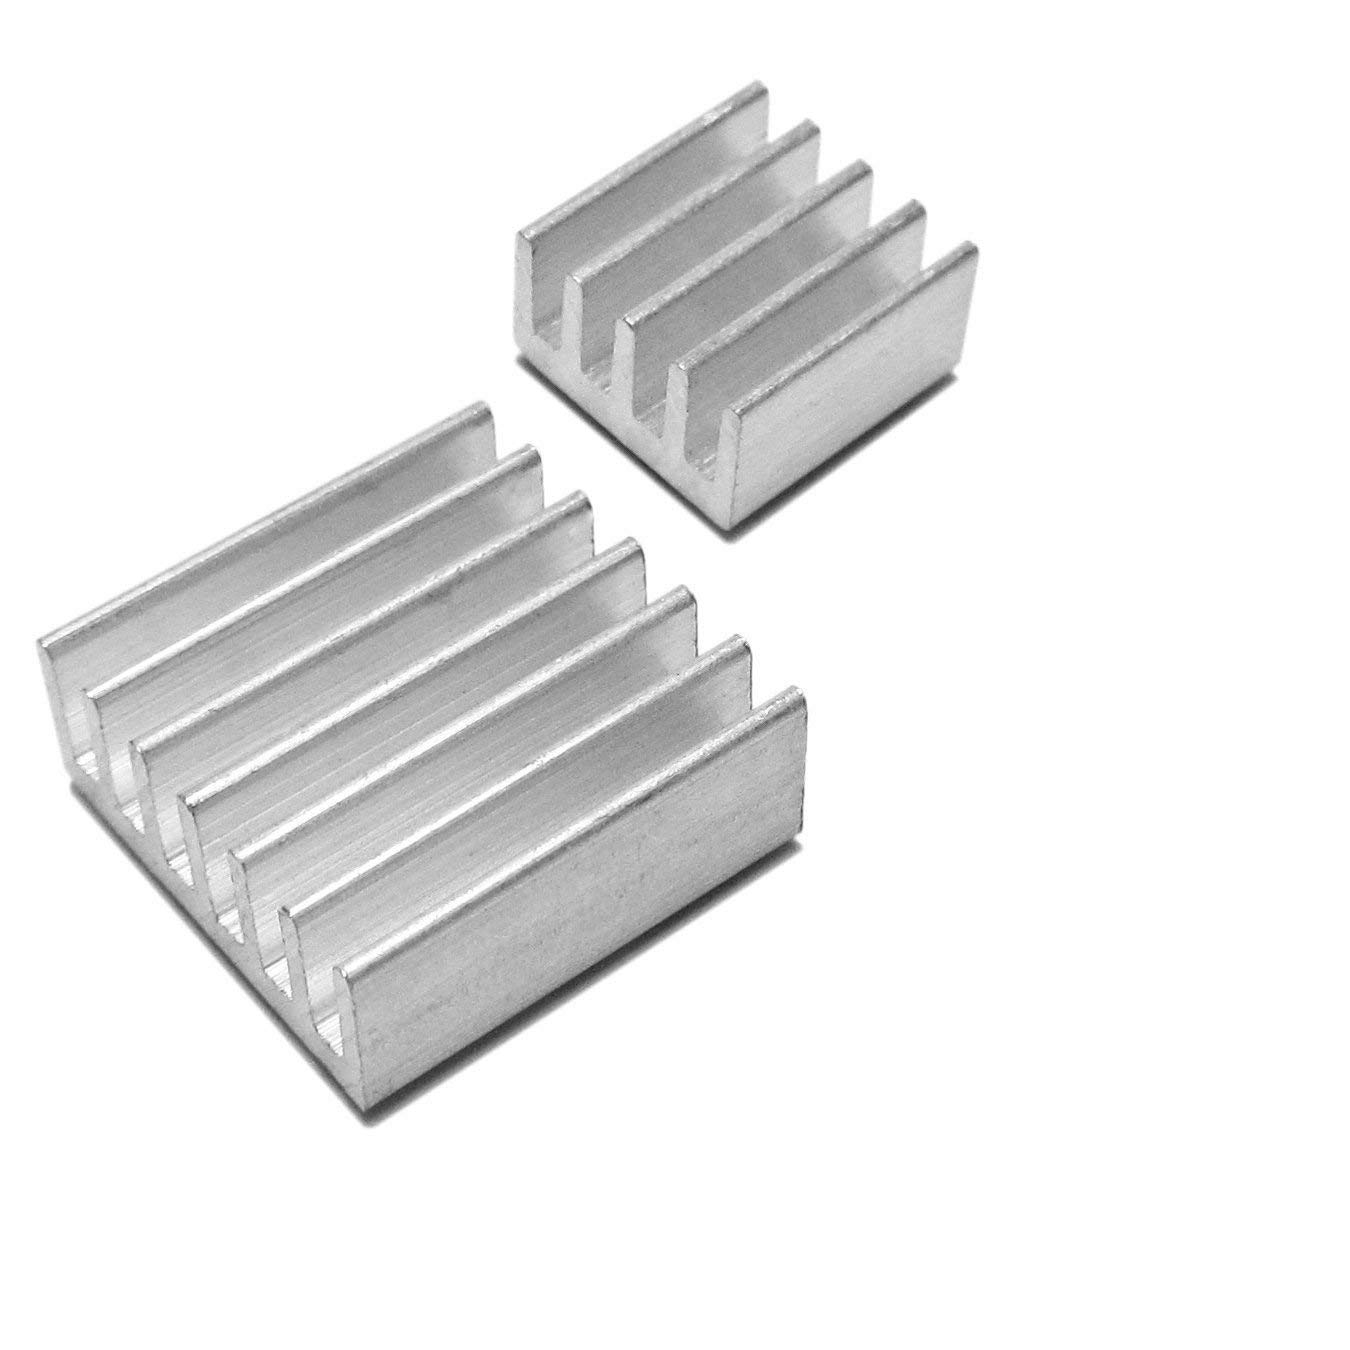 Mega1Comp -Raspberry Pi 3 Model B+ (B Plus), 16GB SD Card Noobs OS pre-Loaded, Aluminum Heat Sink Set - Basic Starter kit